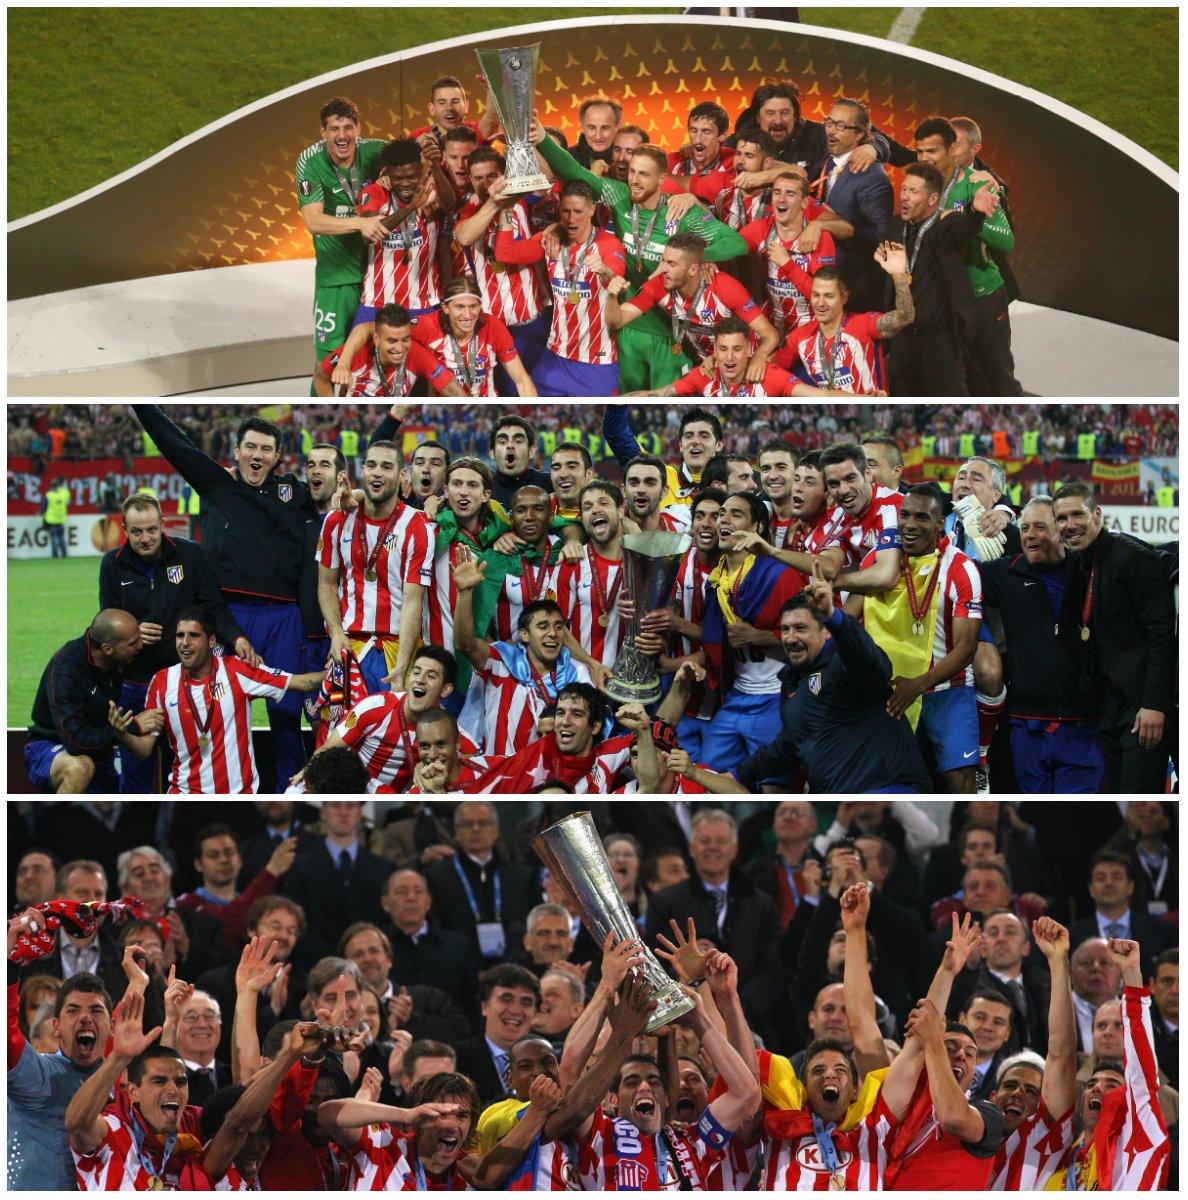 THREE-time champions!  �� 2010 �� 2012 �� 2018  #UELfinal https://t.co/pQpGsWFhPV